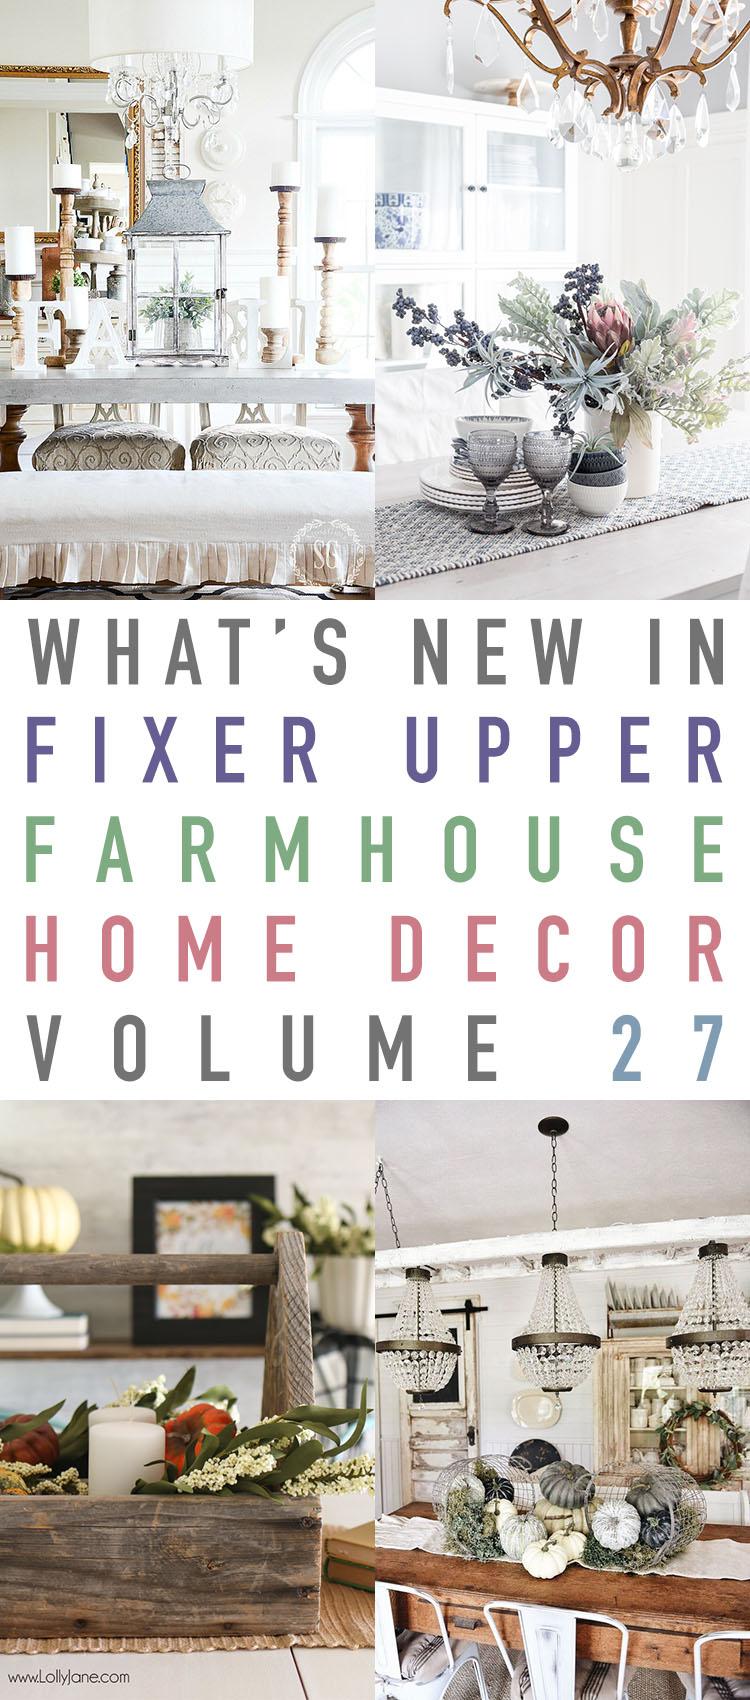 http://thecottagemarket.com/wp-content/uploads/2017/08/Farmhouse-T-1-1.jpg